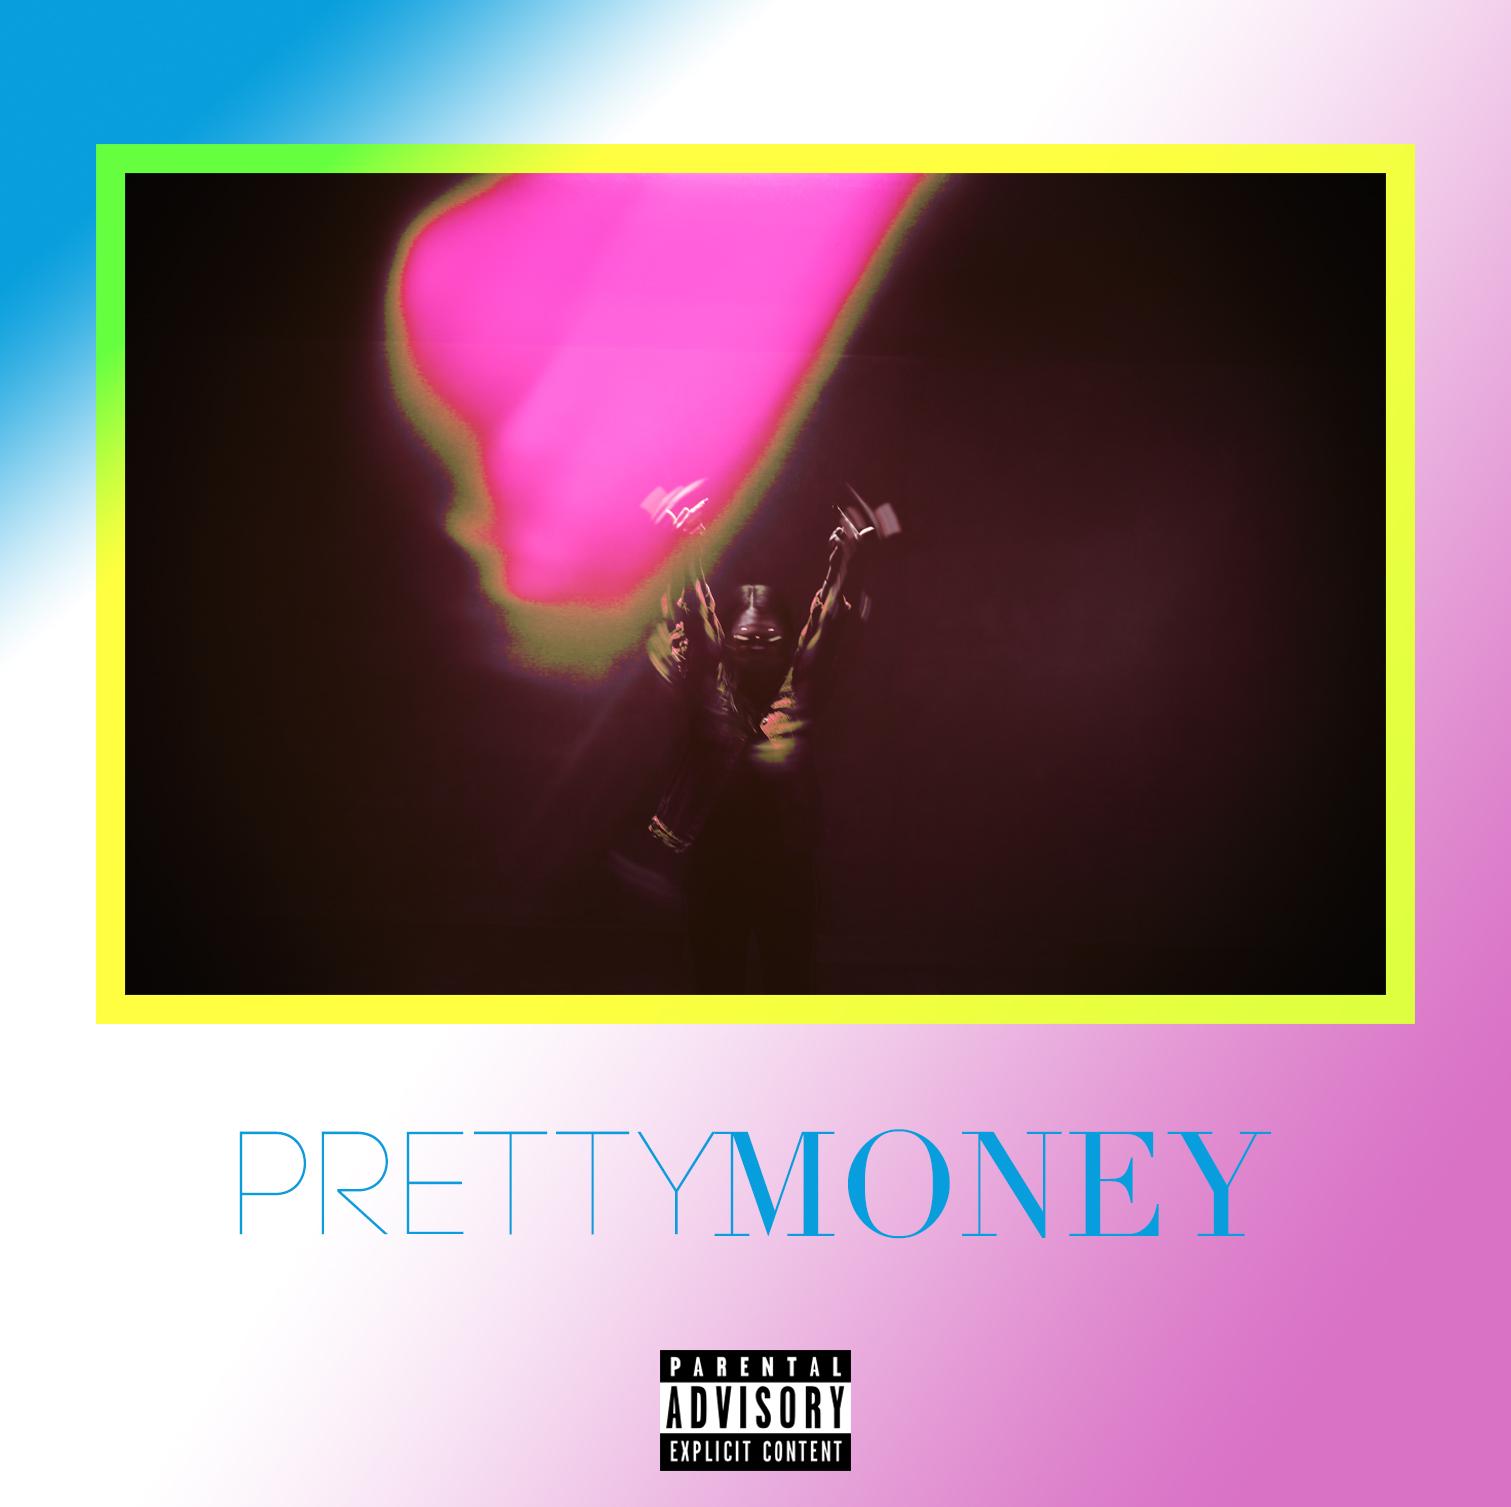 PRETTY-MONEY-ALBUM-CONCEPT.jpg